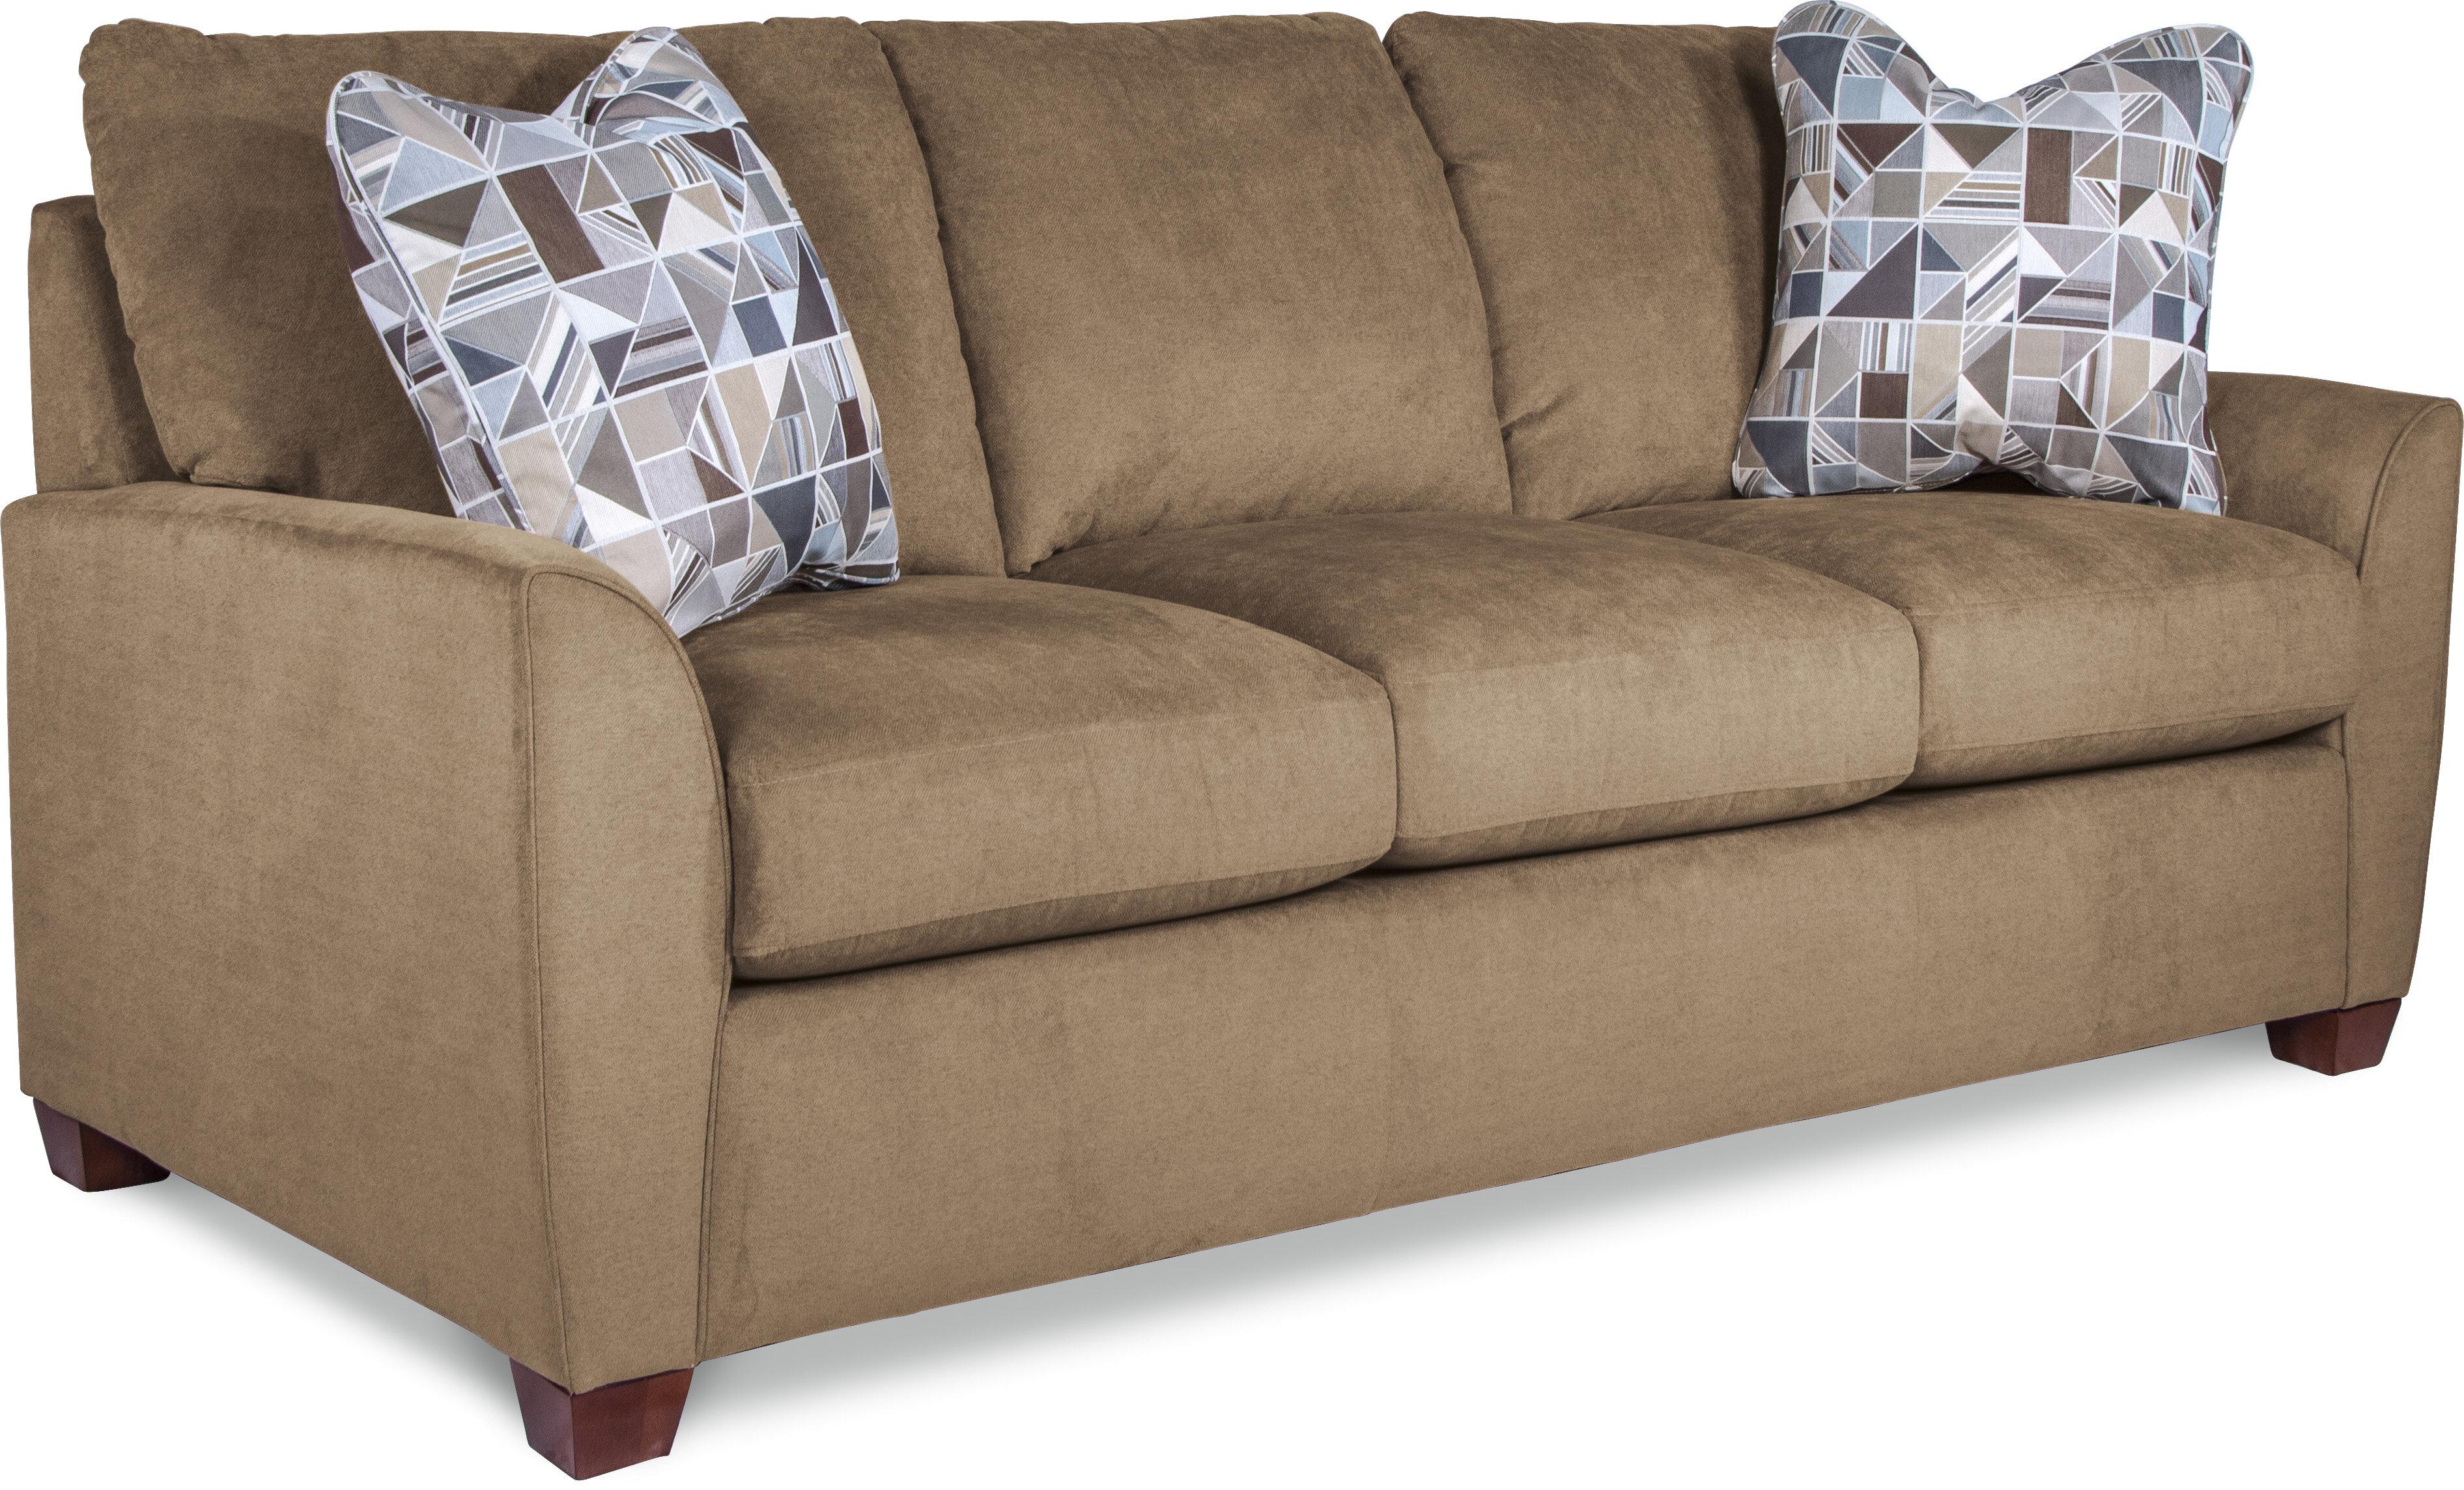 Amy Premier Supreme-Comfort Sleeper Sofa